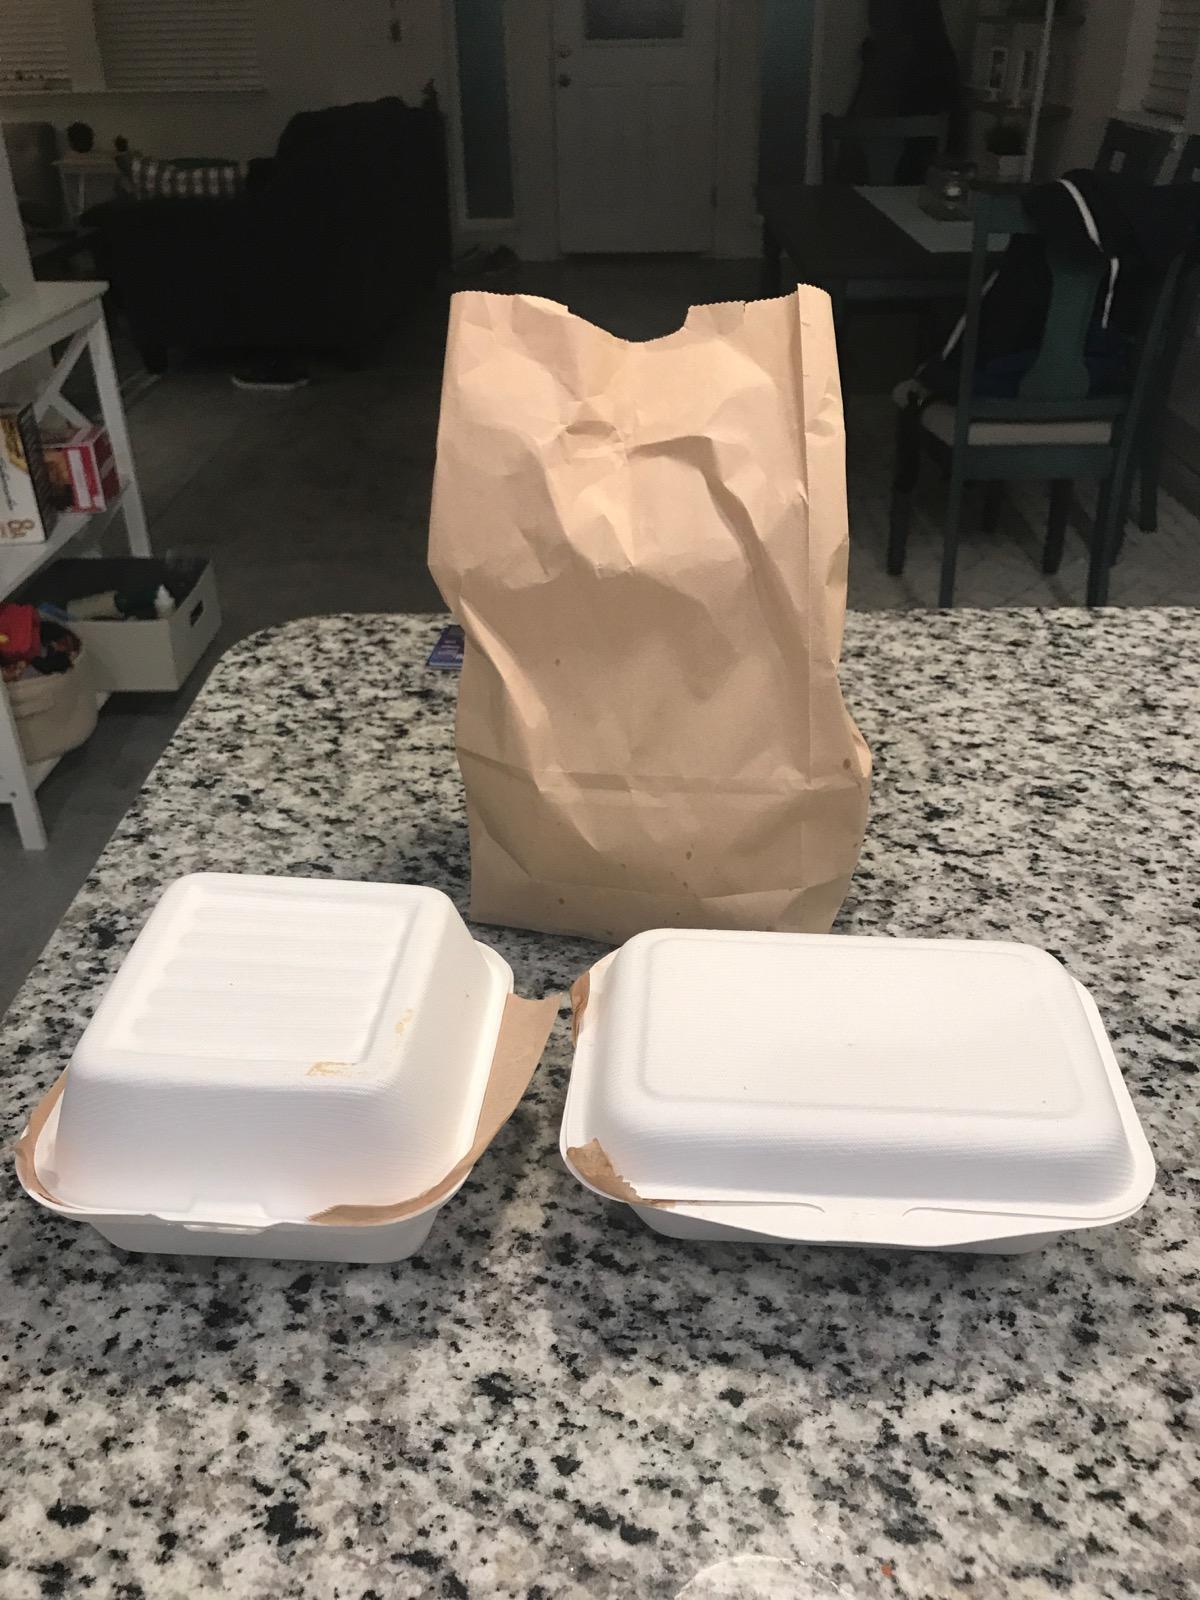 Customer #1 - Food 2